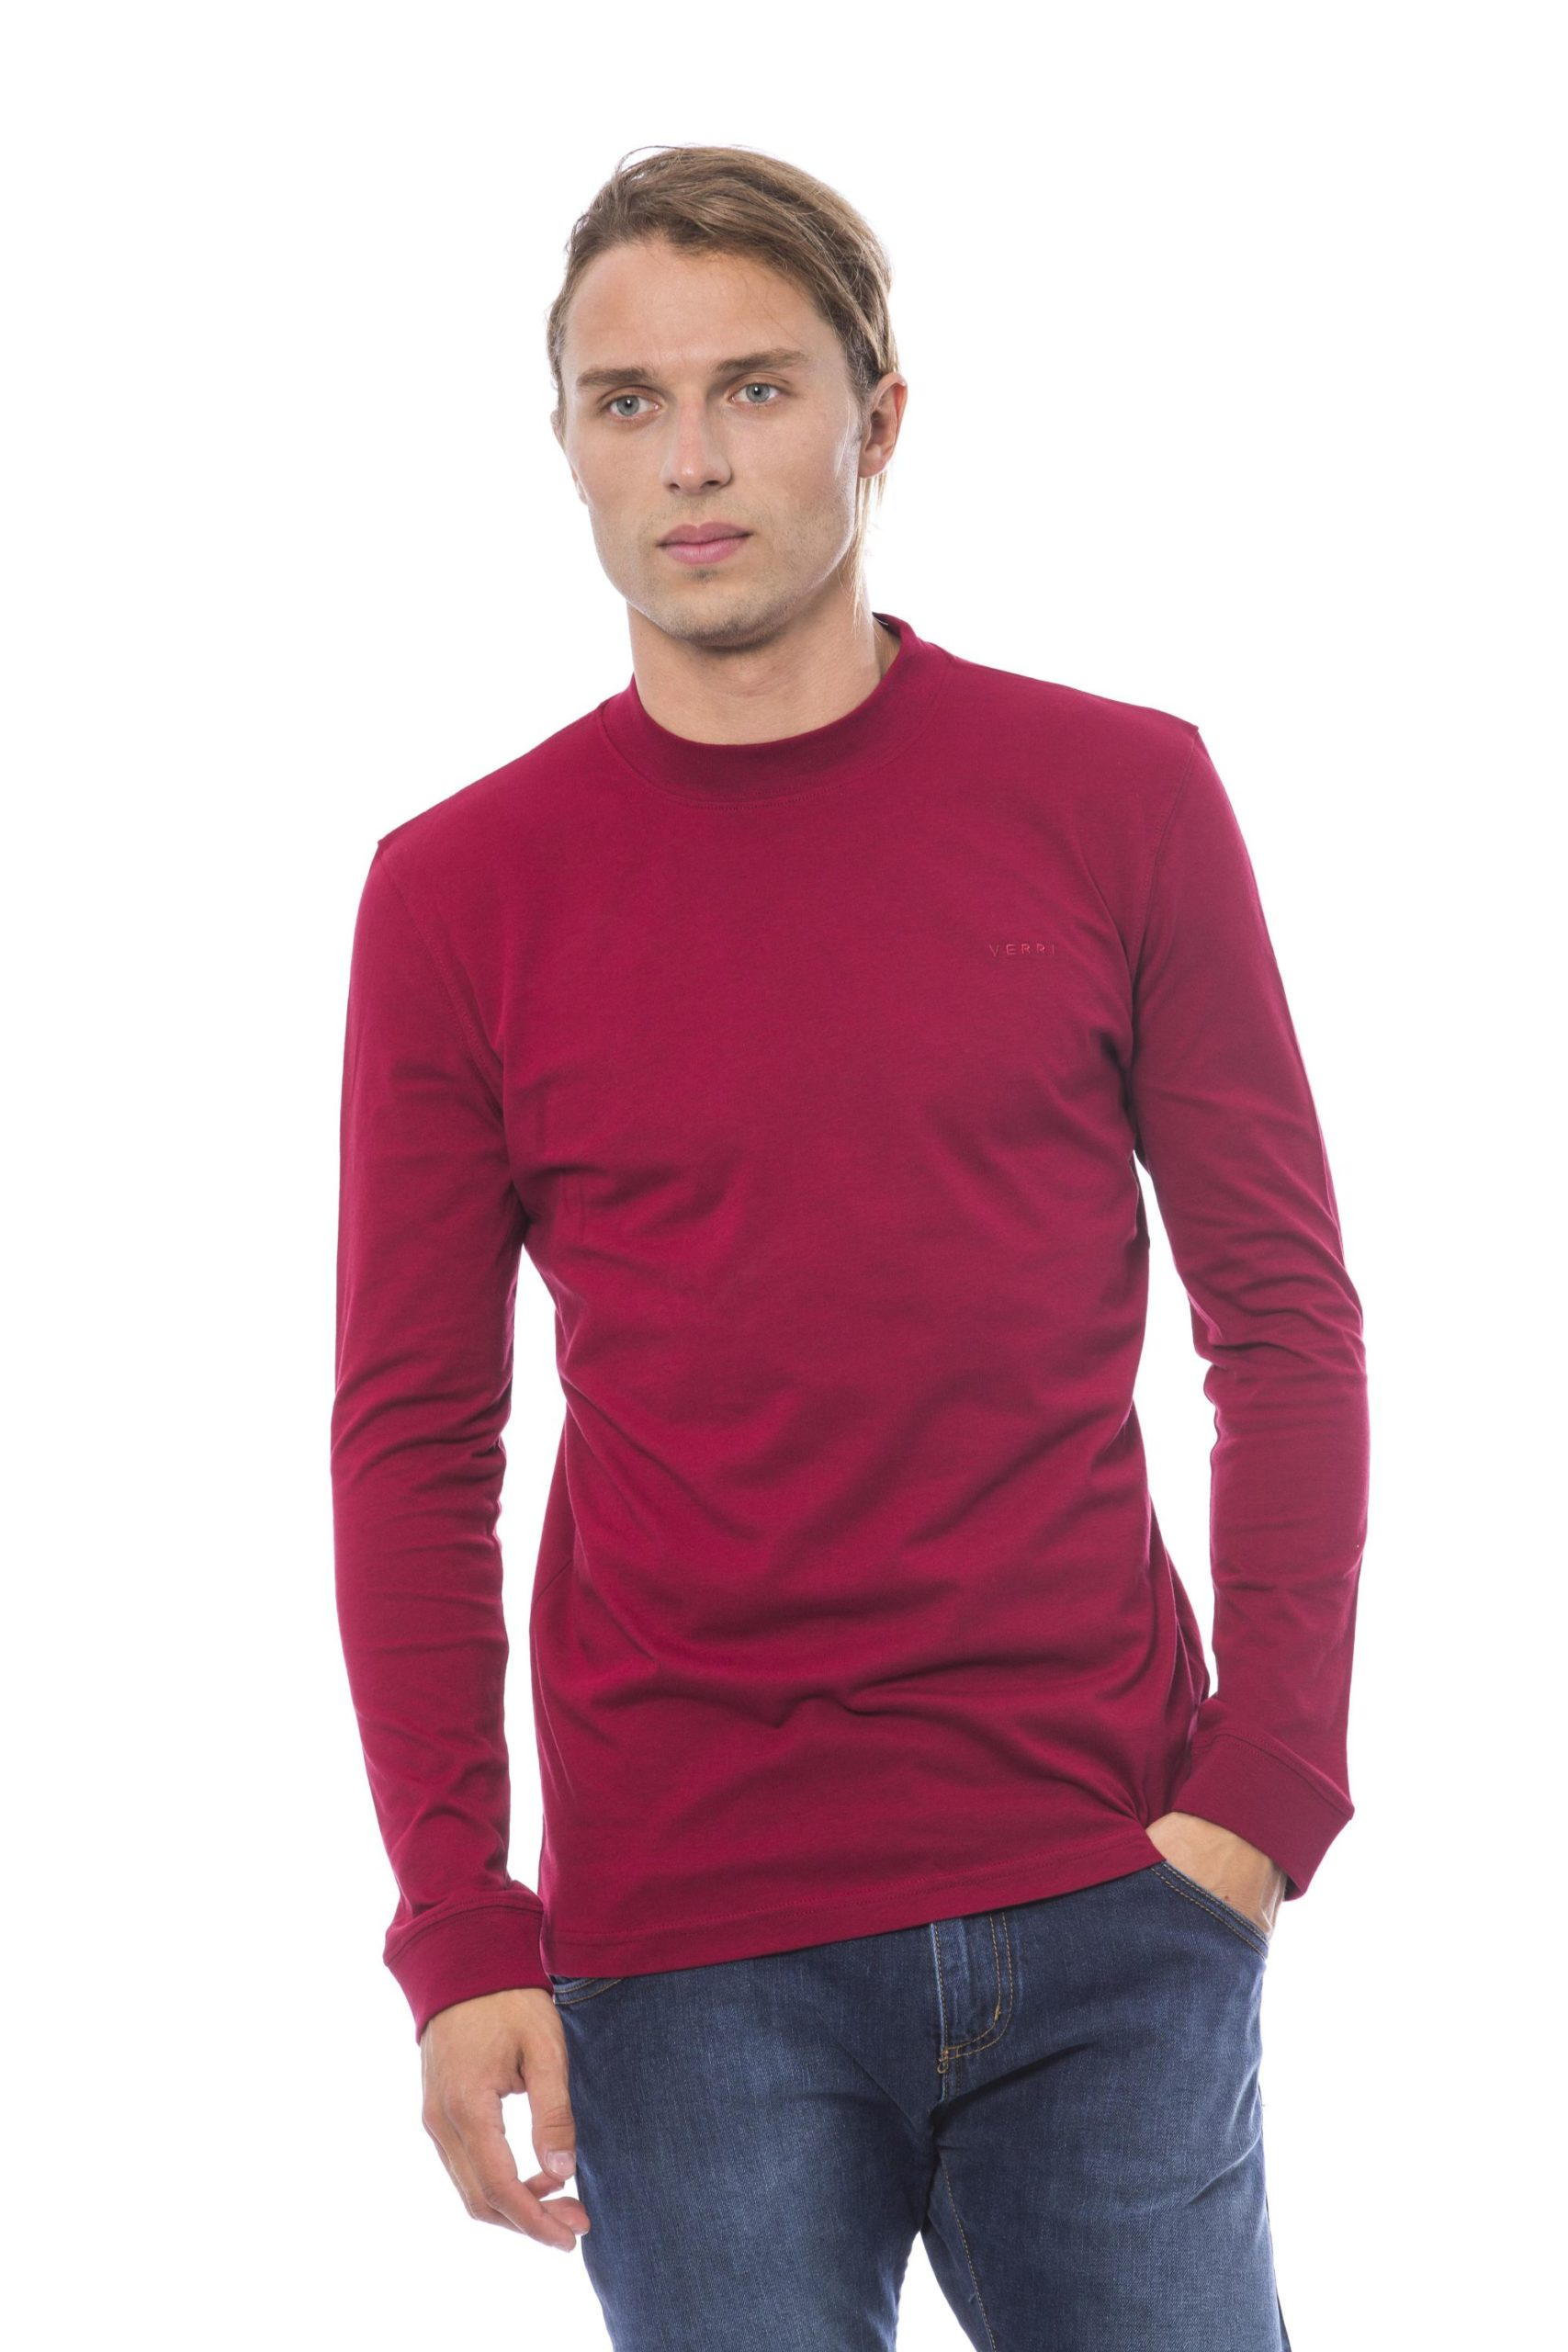 Verri Men's Vbordeaux Sweater Burgundy VE817411 - XL